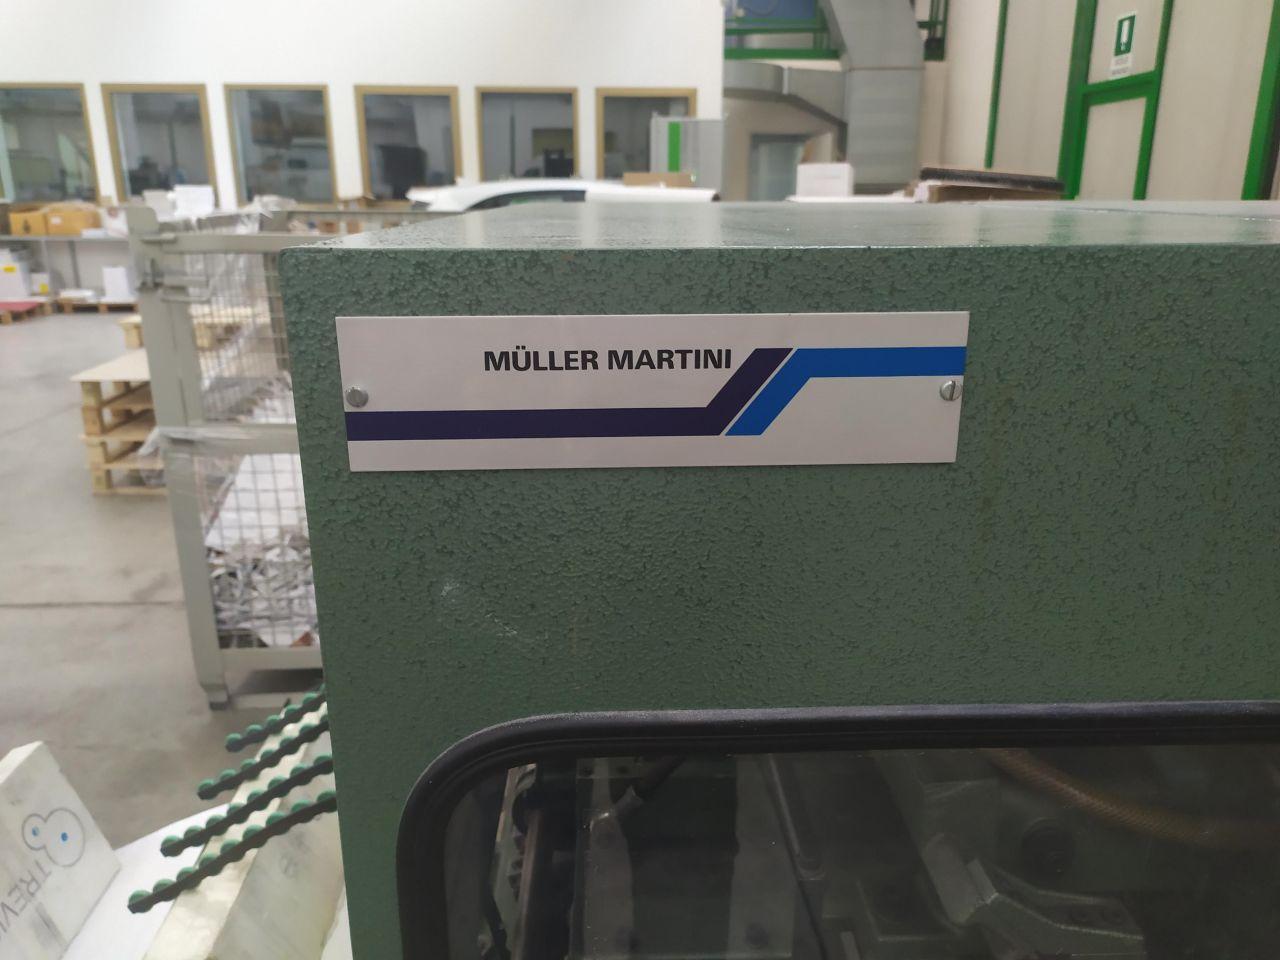 MULLER-MARTINI 321, Year : 1990, ref.69595 | www.coci-sa.com/en | 69595n_1.jpg